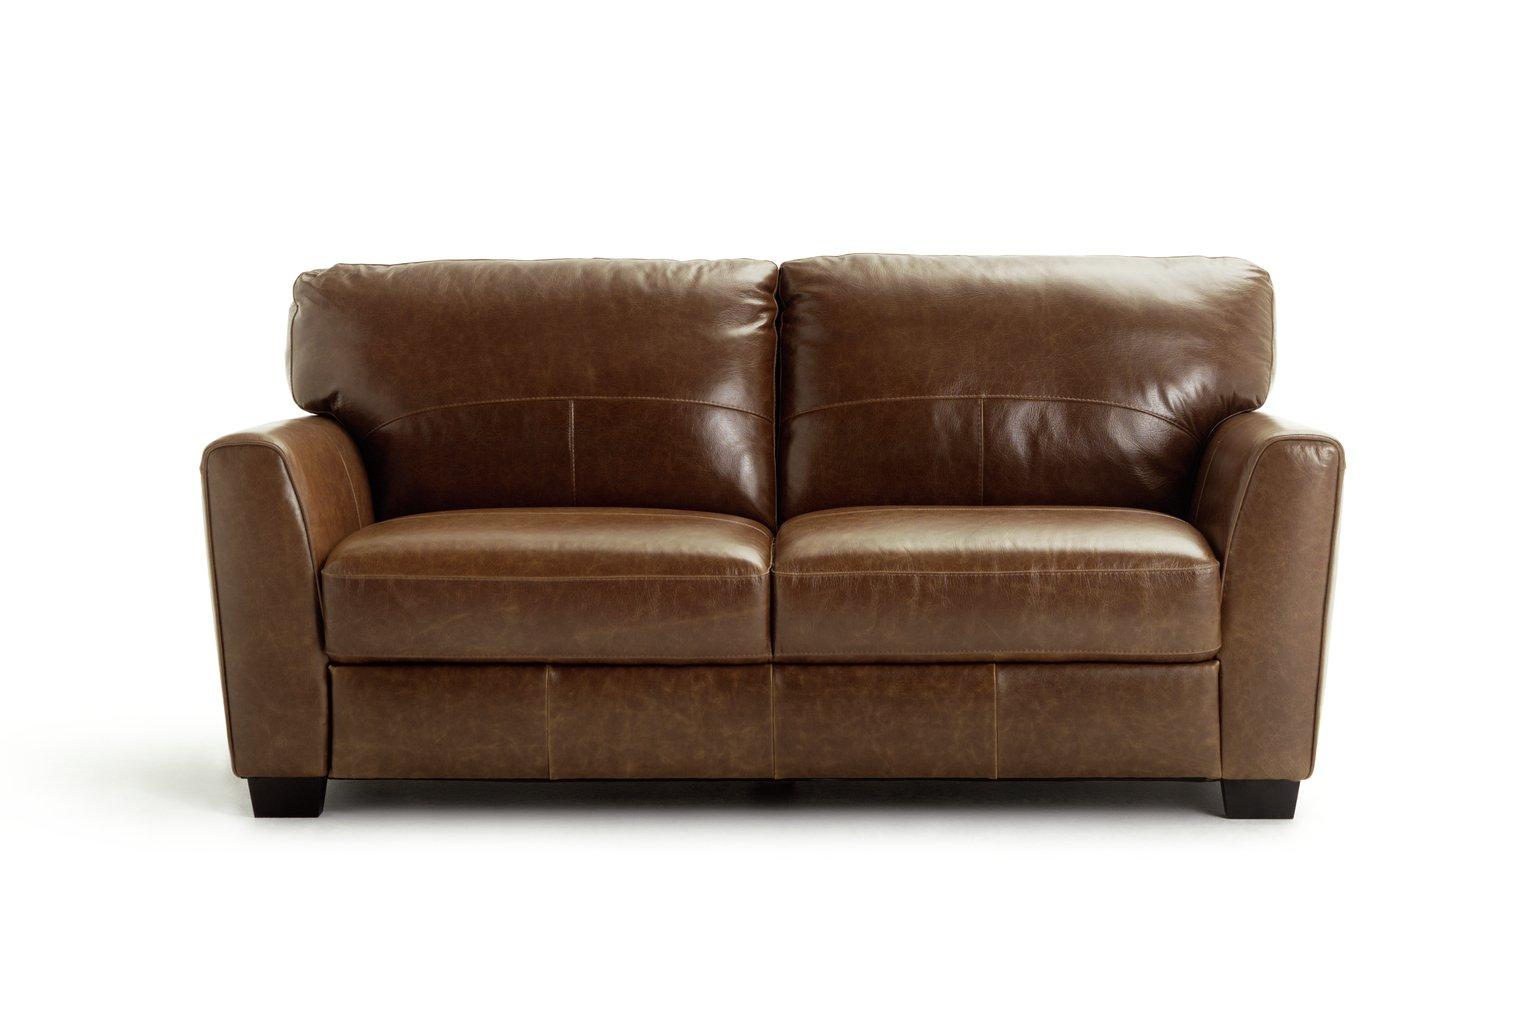 Habitat Milford 3 Seater Leather Sofa - Tan